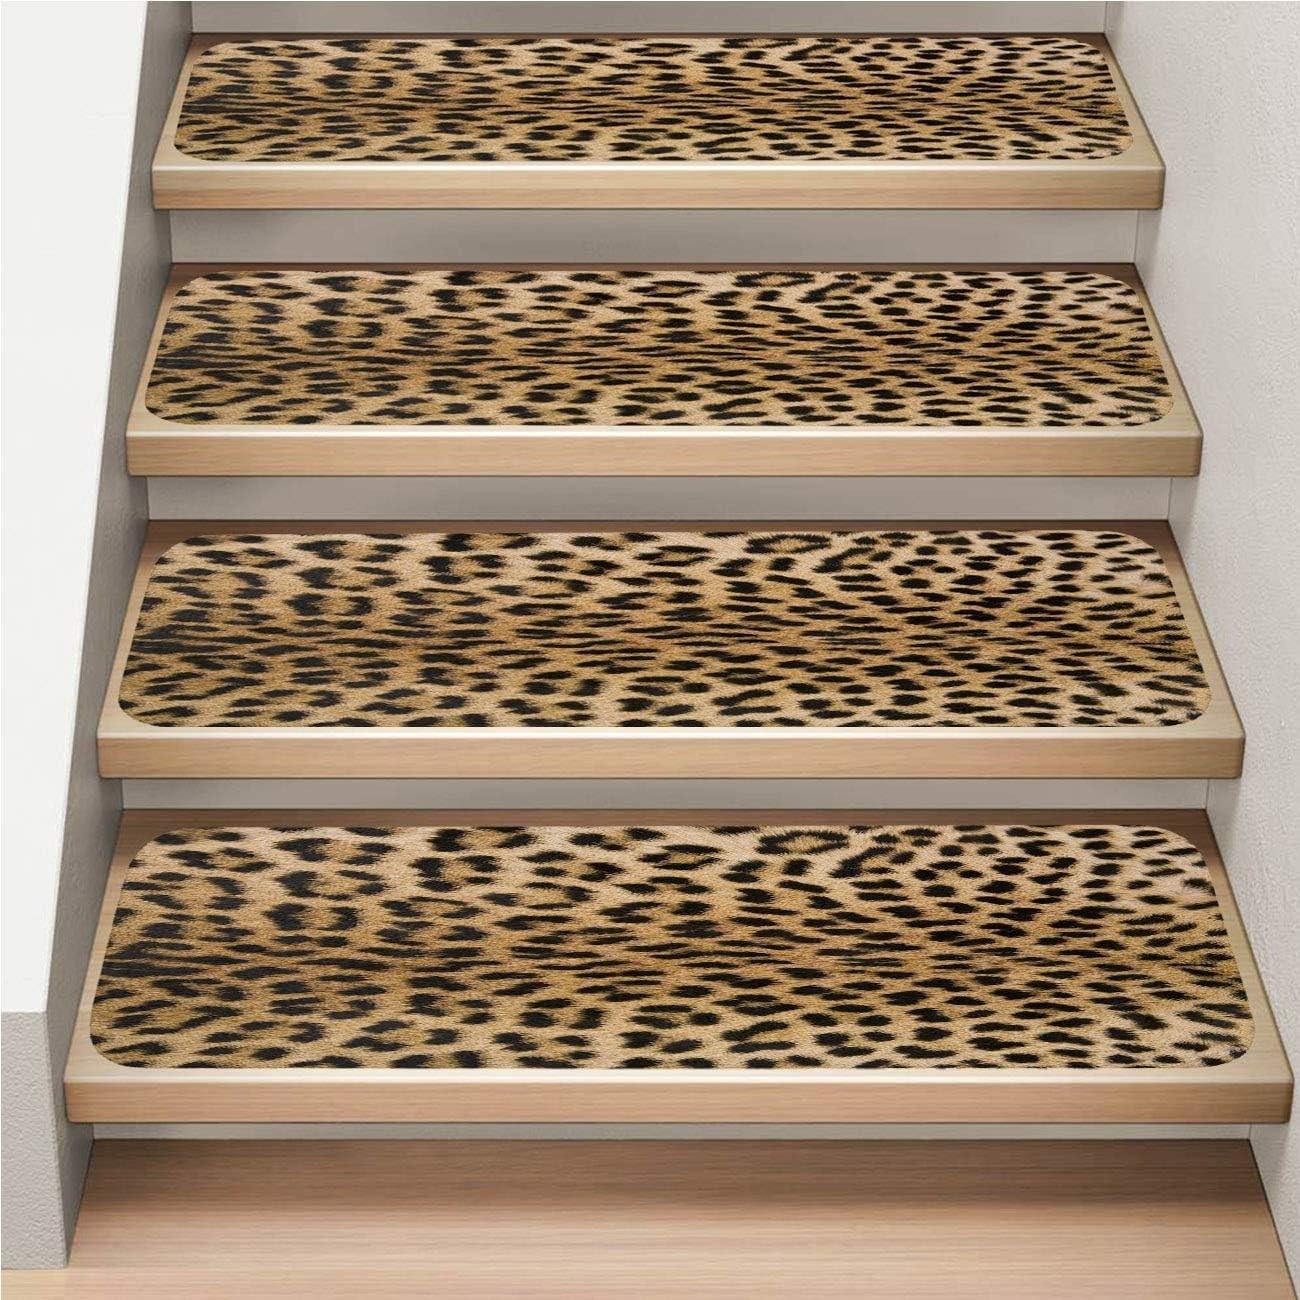 7 Pack Carpet Stair Tread Non Slip Soft Skin S Texture 2 Of   Leopard Carpet On Stairs   Zebra Print   Giraffe Print   Milliken   Patterned   Antilocarpa